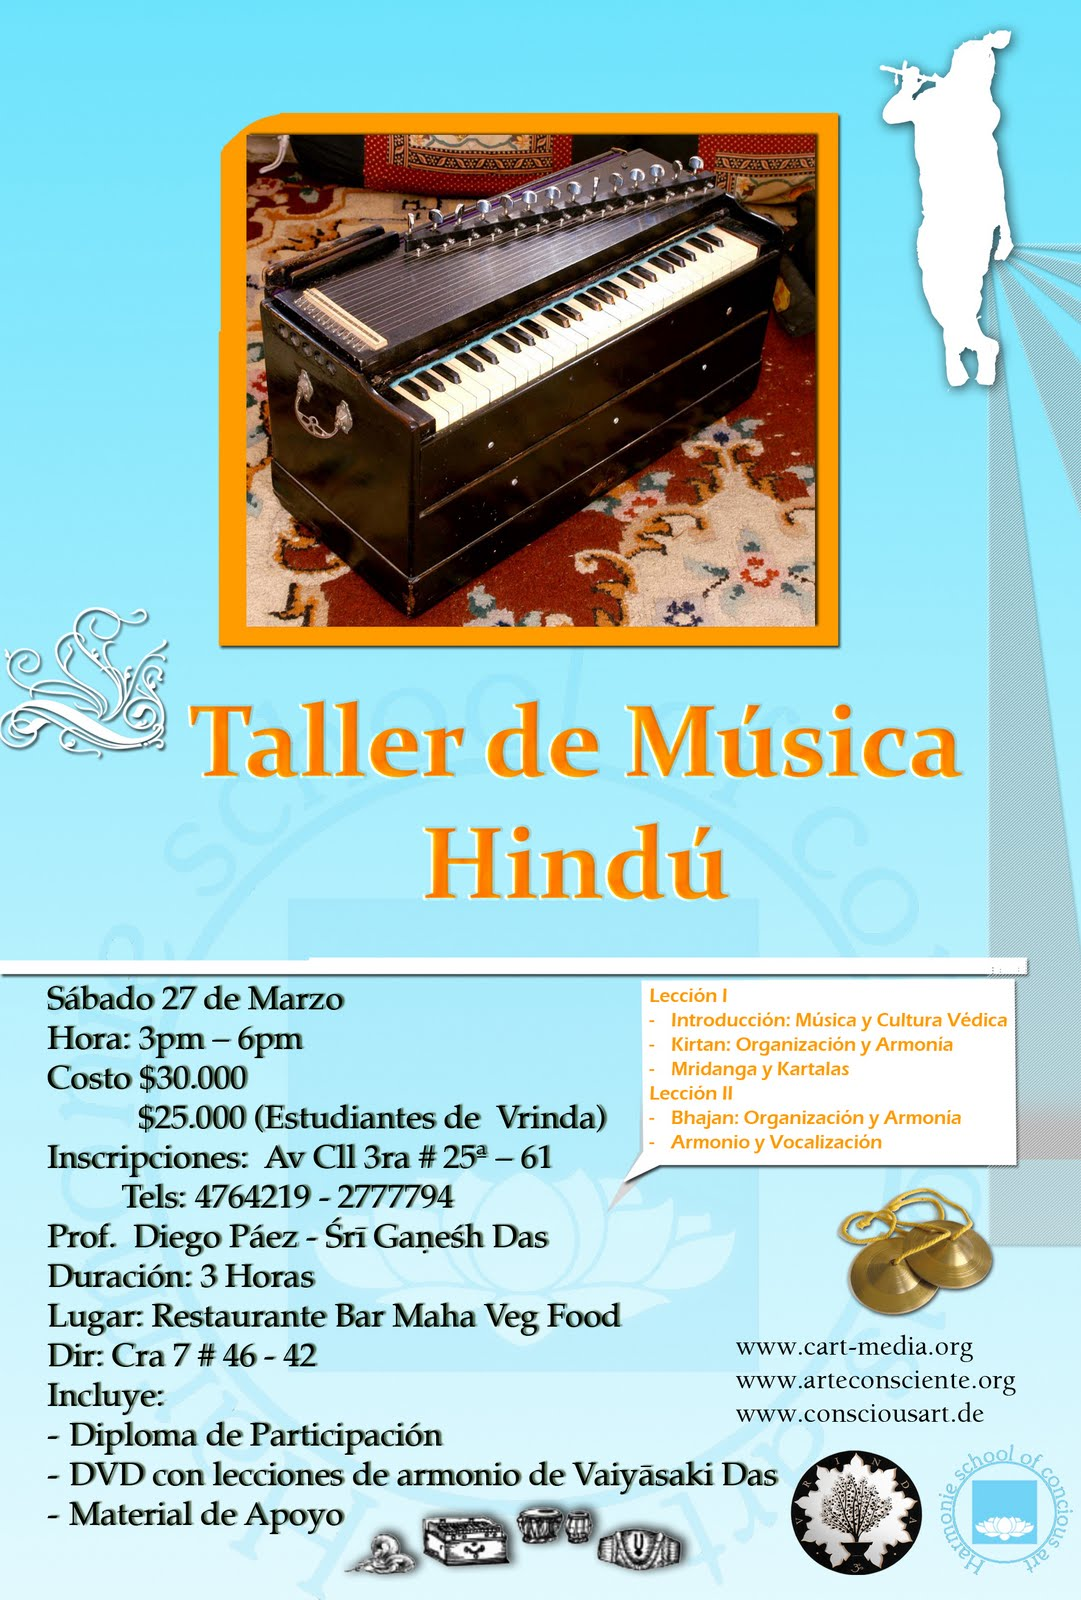 [Taller+de+Música+Hindú.jpg]